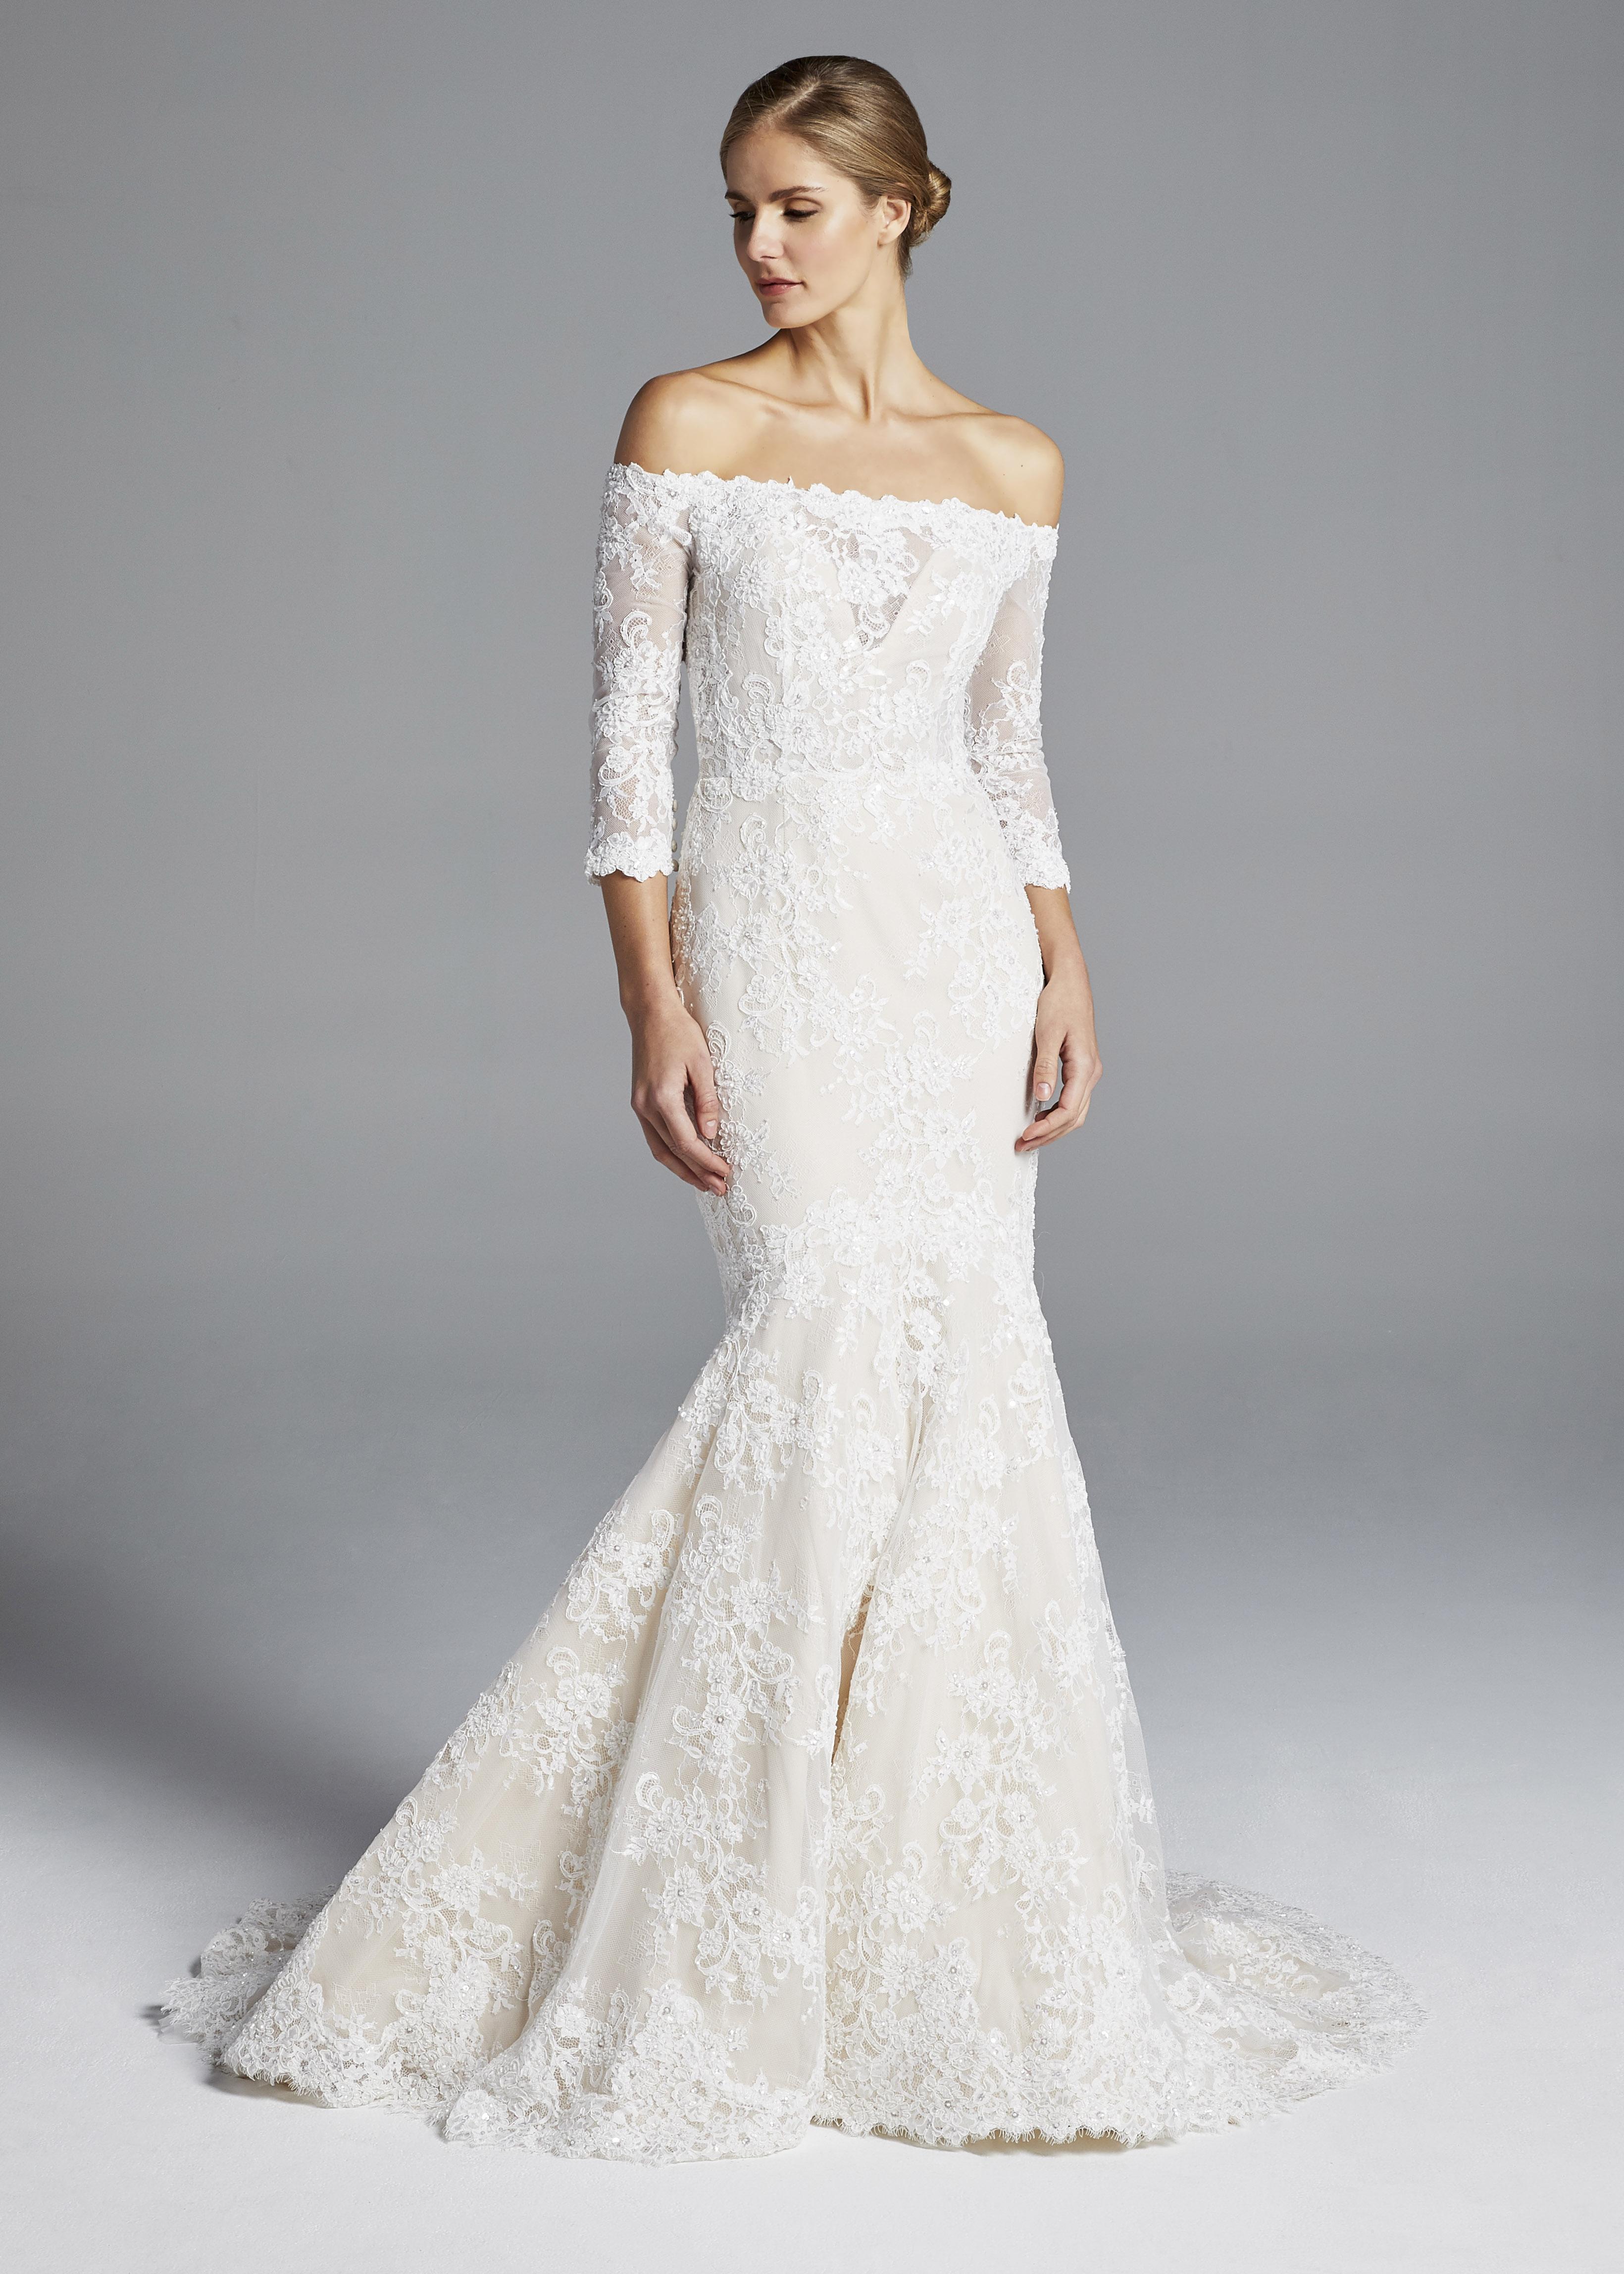 anne barge off the shoulder lace mermaid wedding dress spring 2019